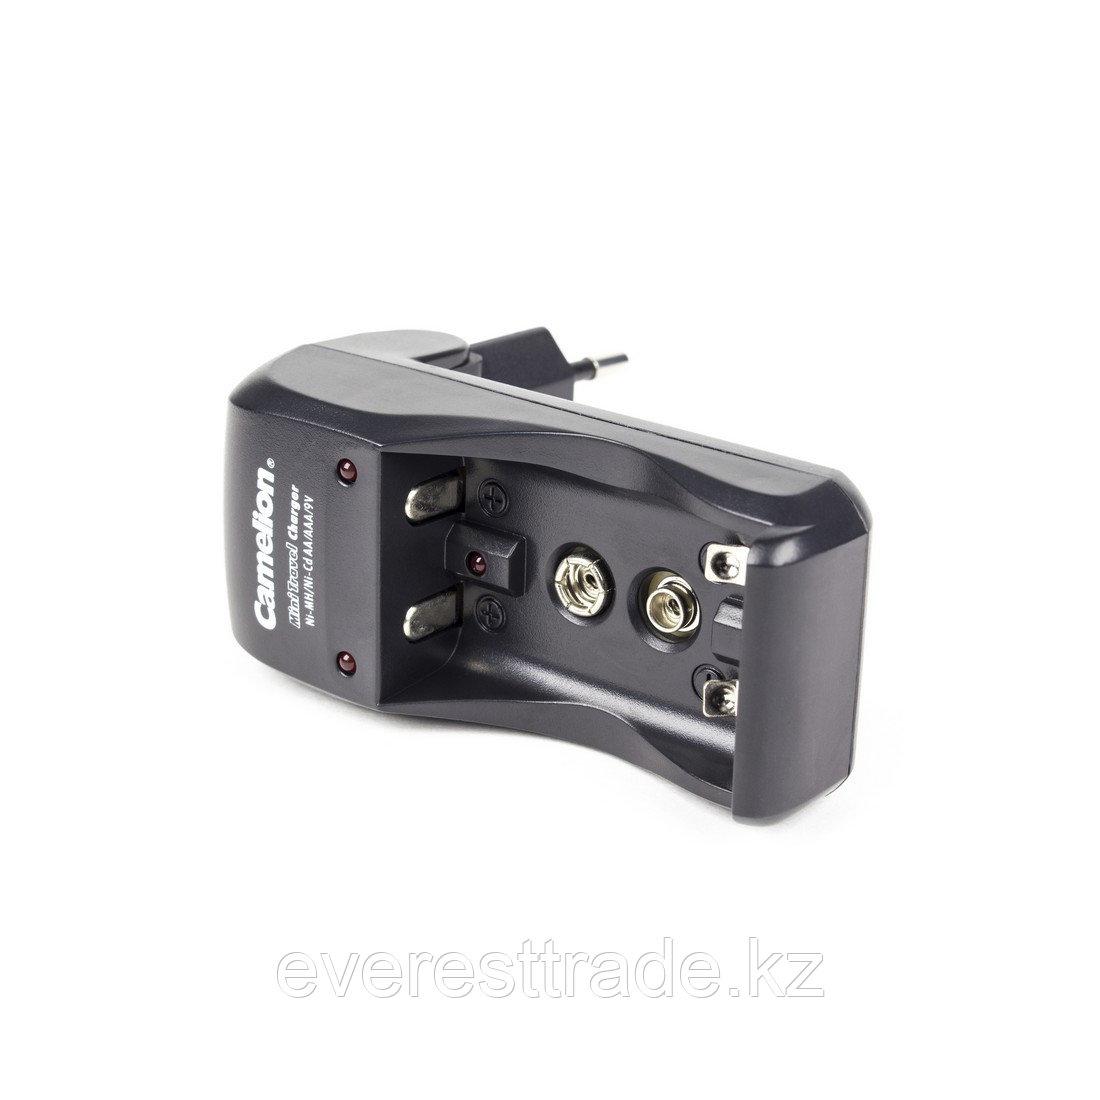 Зарядное устройство, CAMELION, BC-1001A, 2*AAA/2*AA/1*9V(крона)